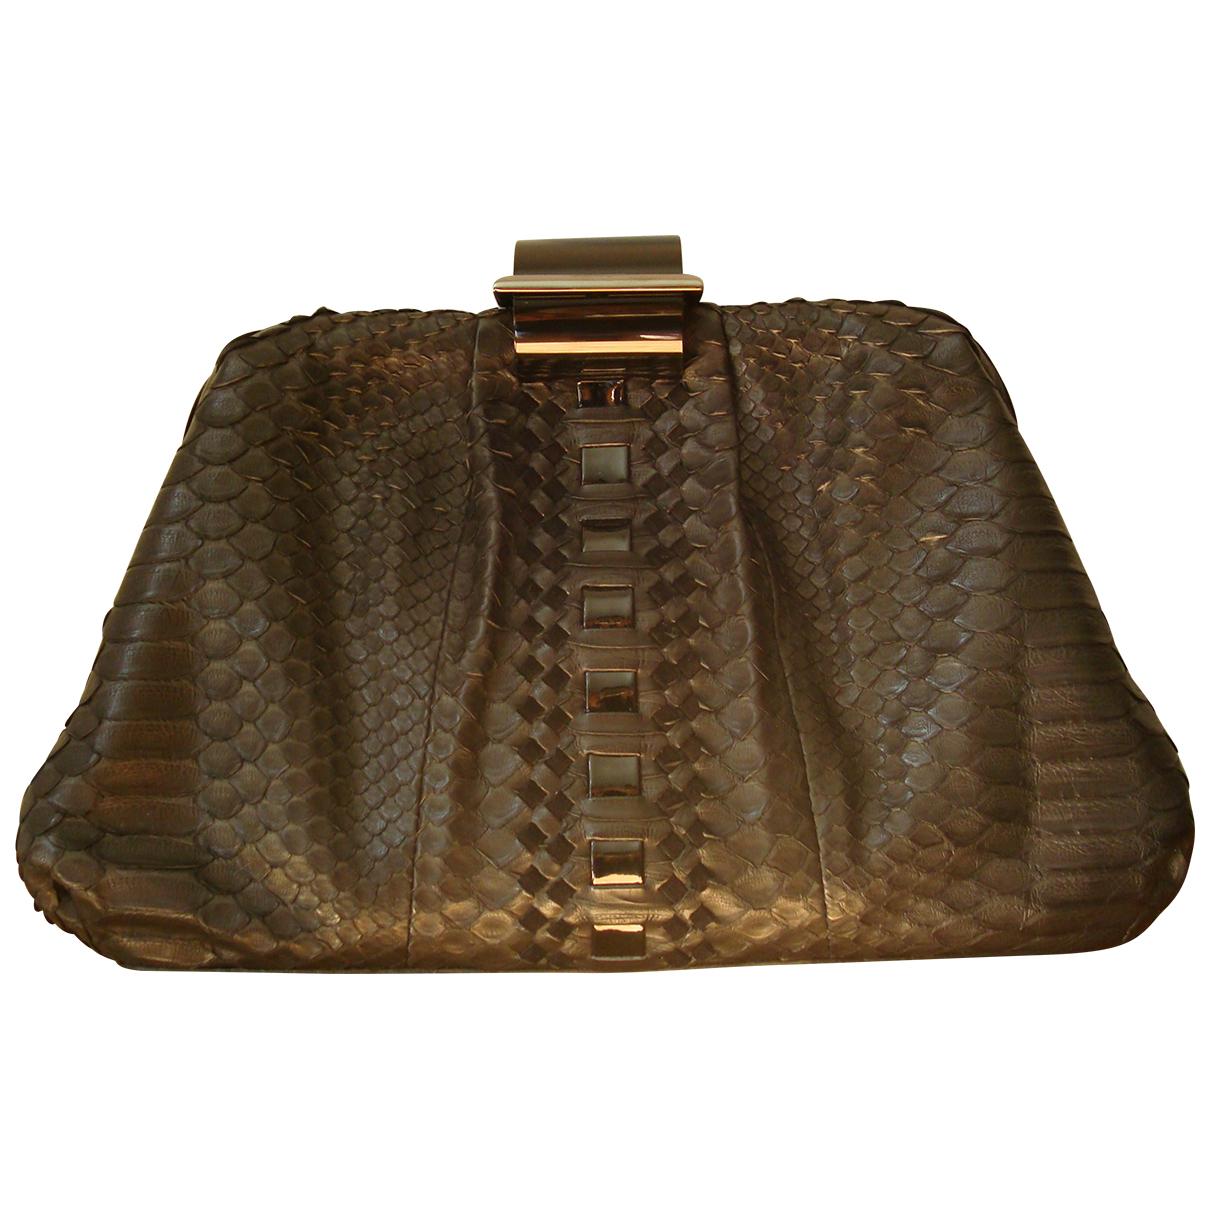 Salvatore Ferragamo \N Black Python Clutch bag for Women \N